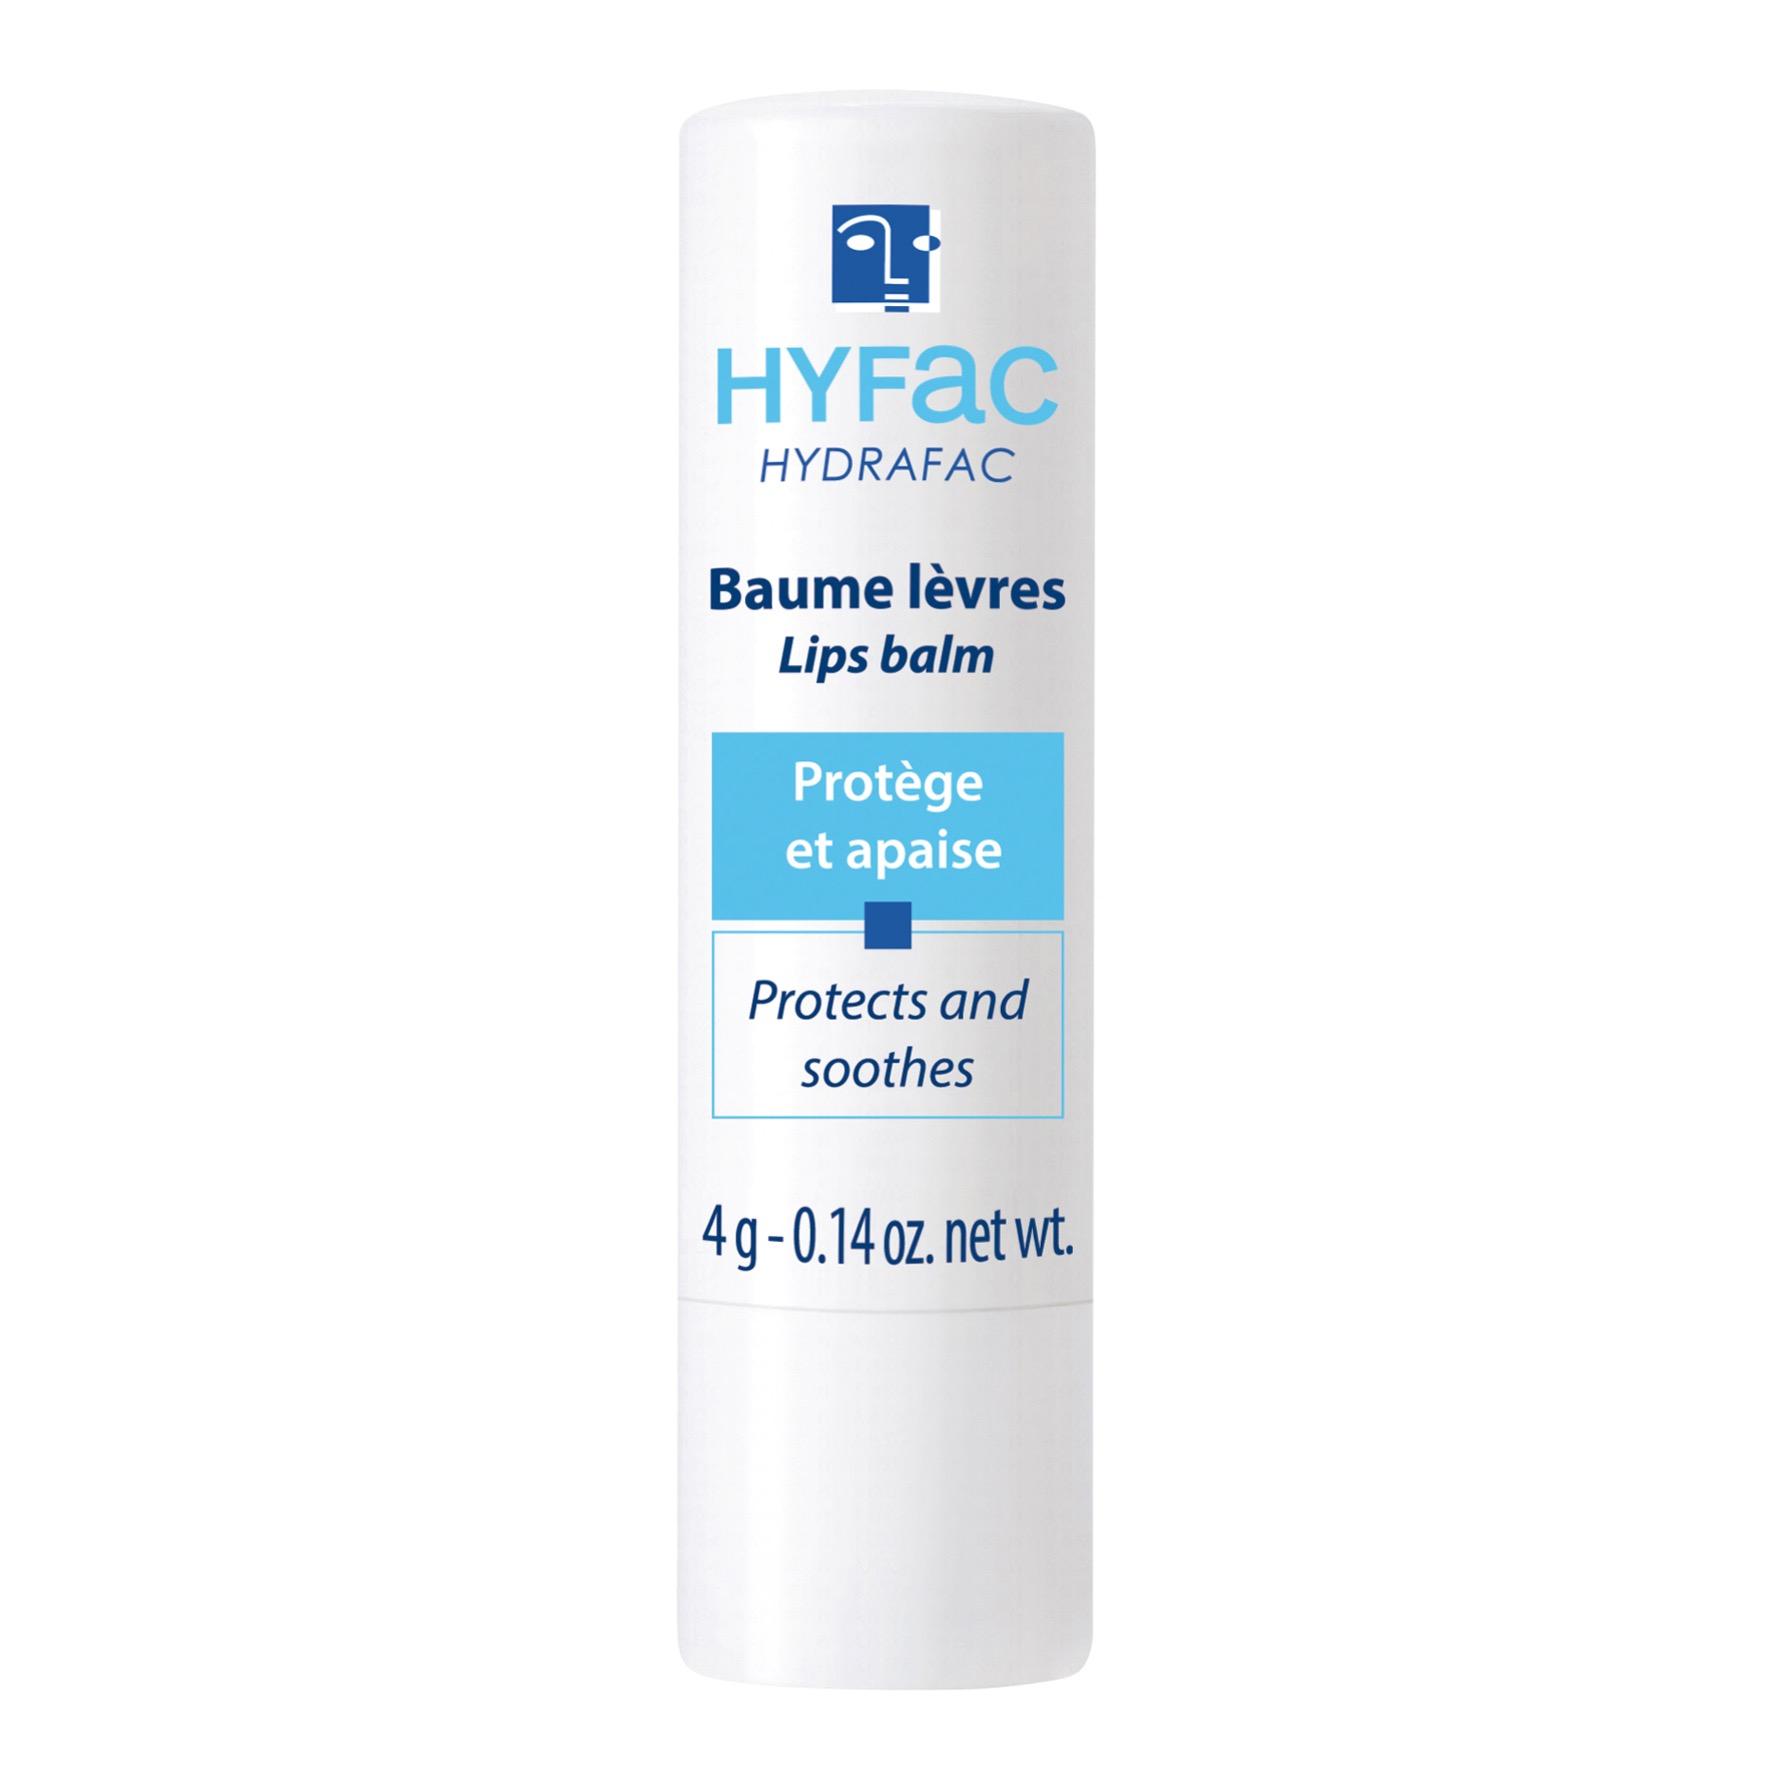 HYDRAFAC nourishing lip balm